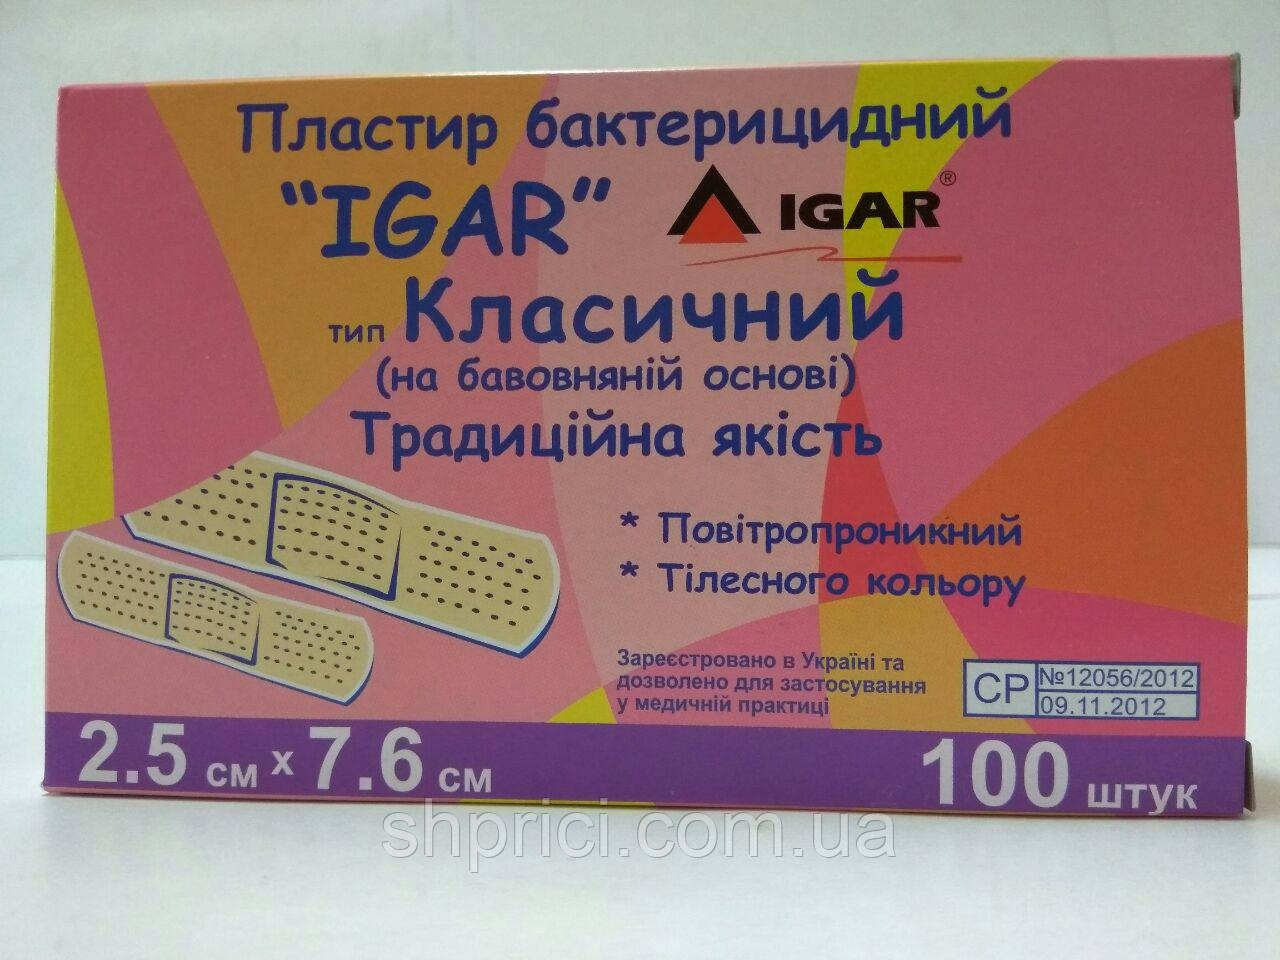 Пластырь бактерицидный 2.5*7.6 см Классический / ИГАР